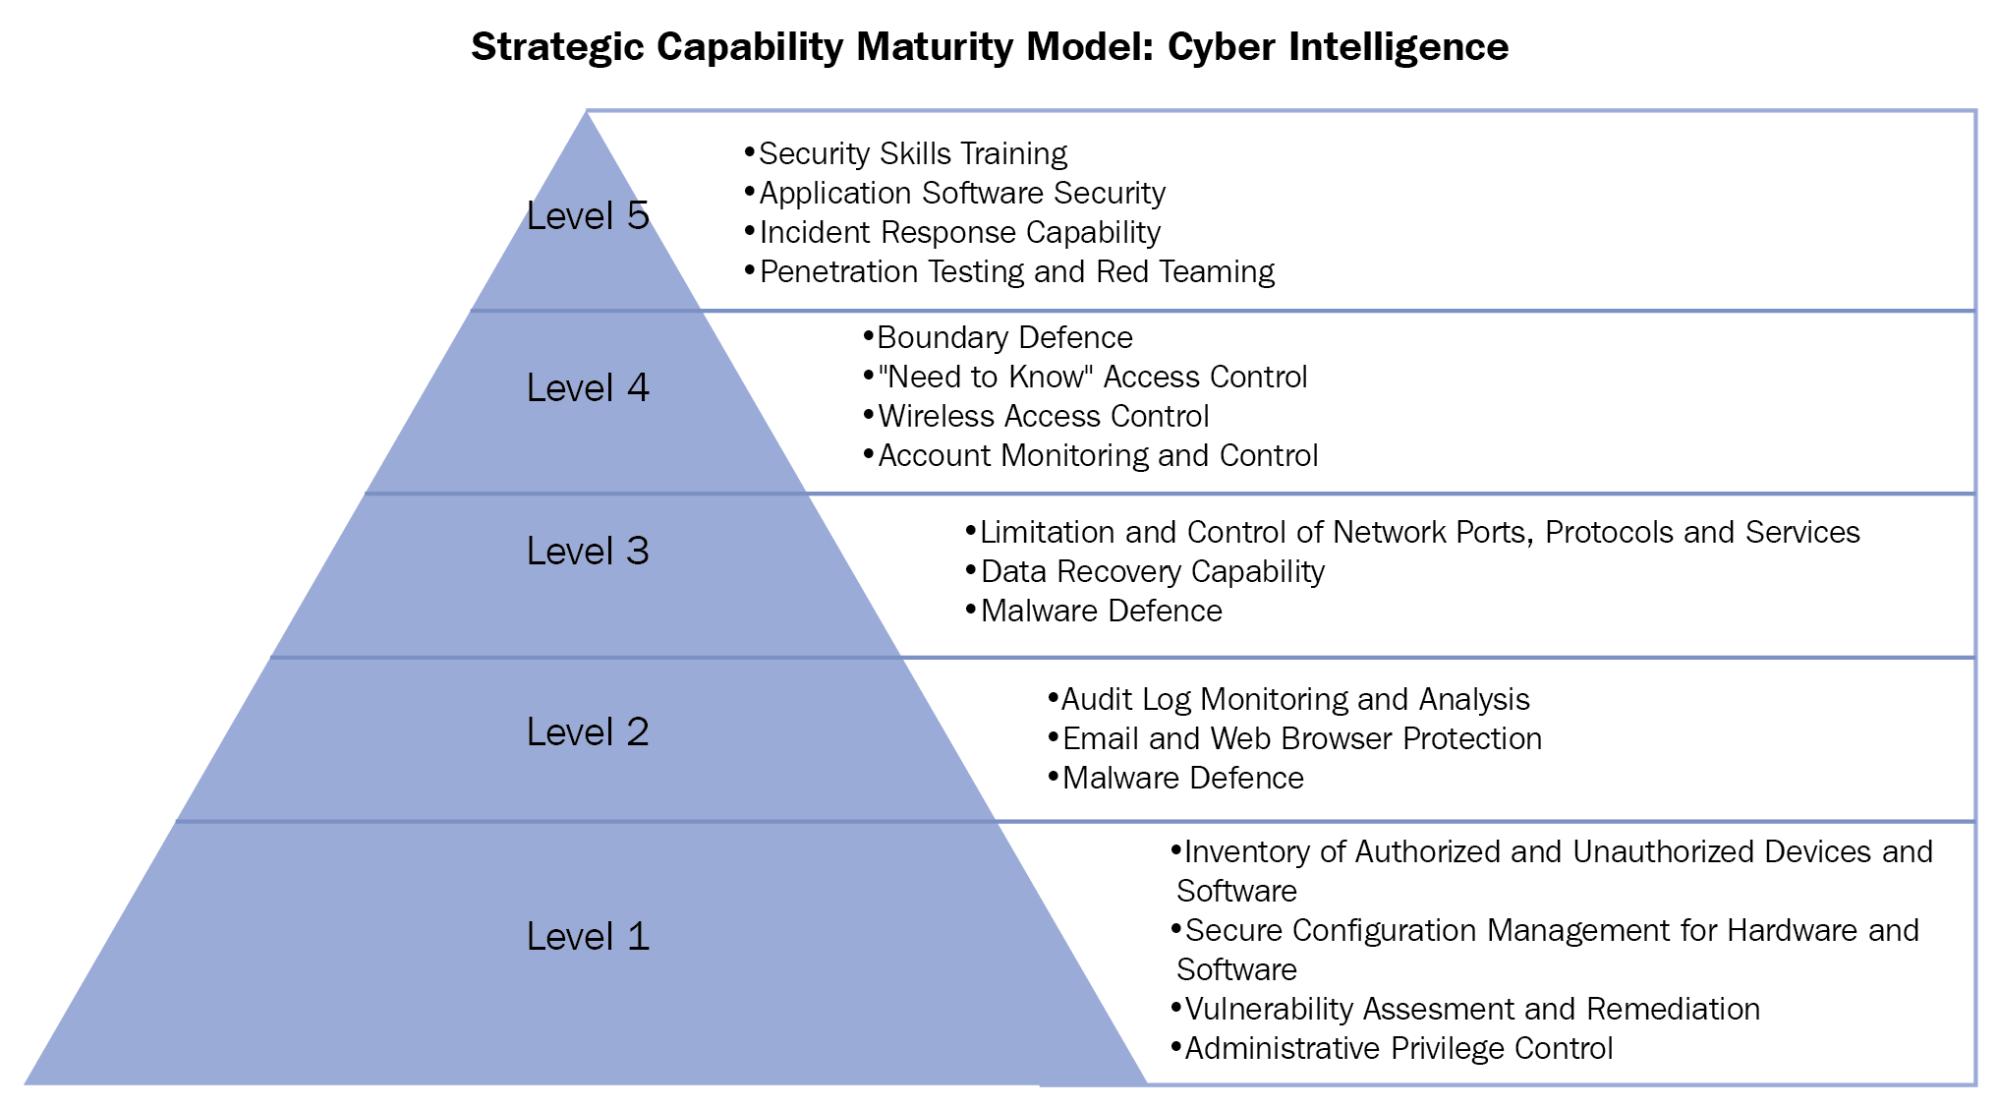 Developing a strategic cyber intelligence capability